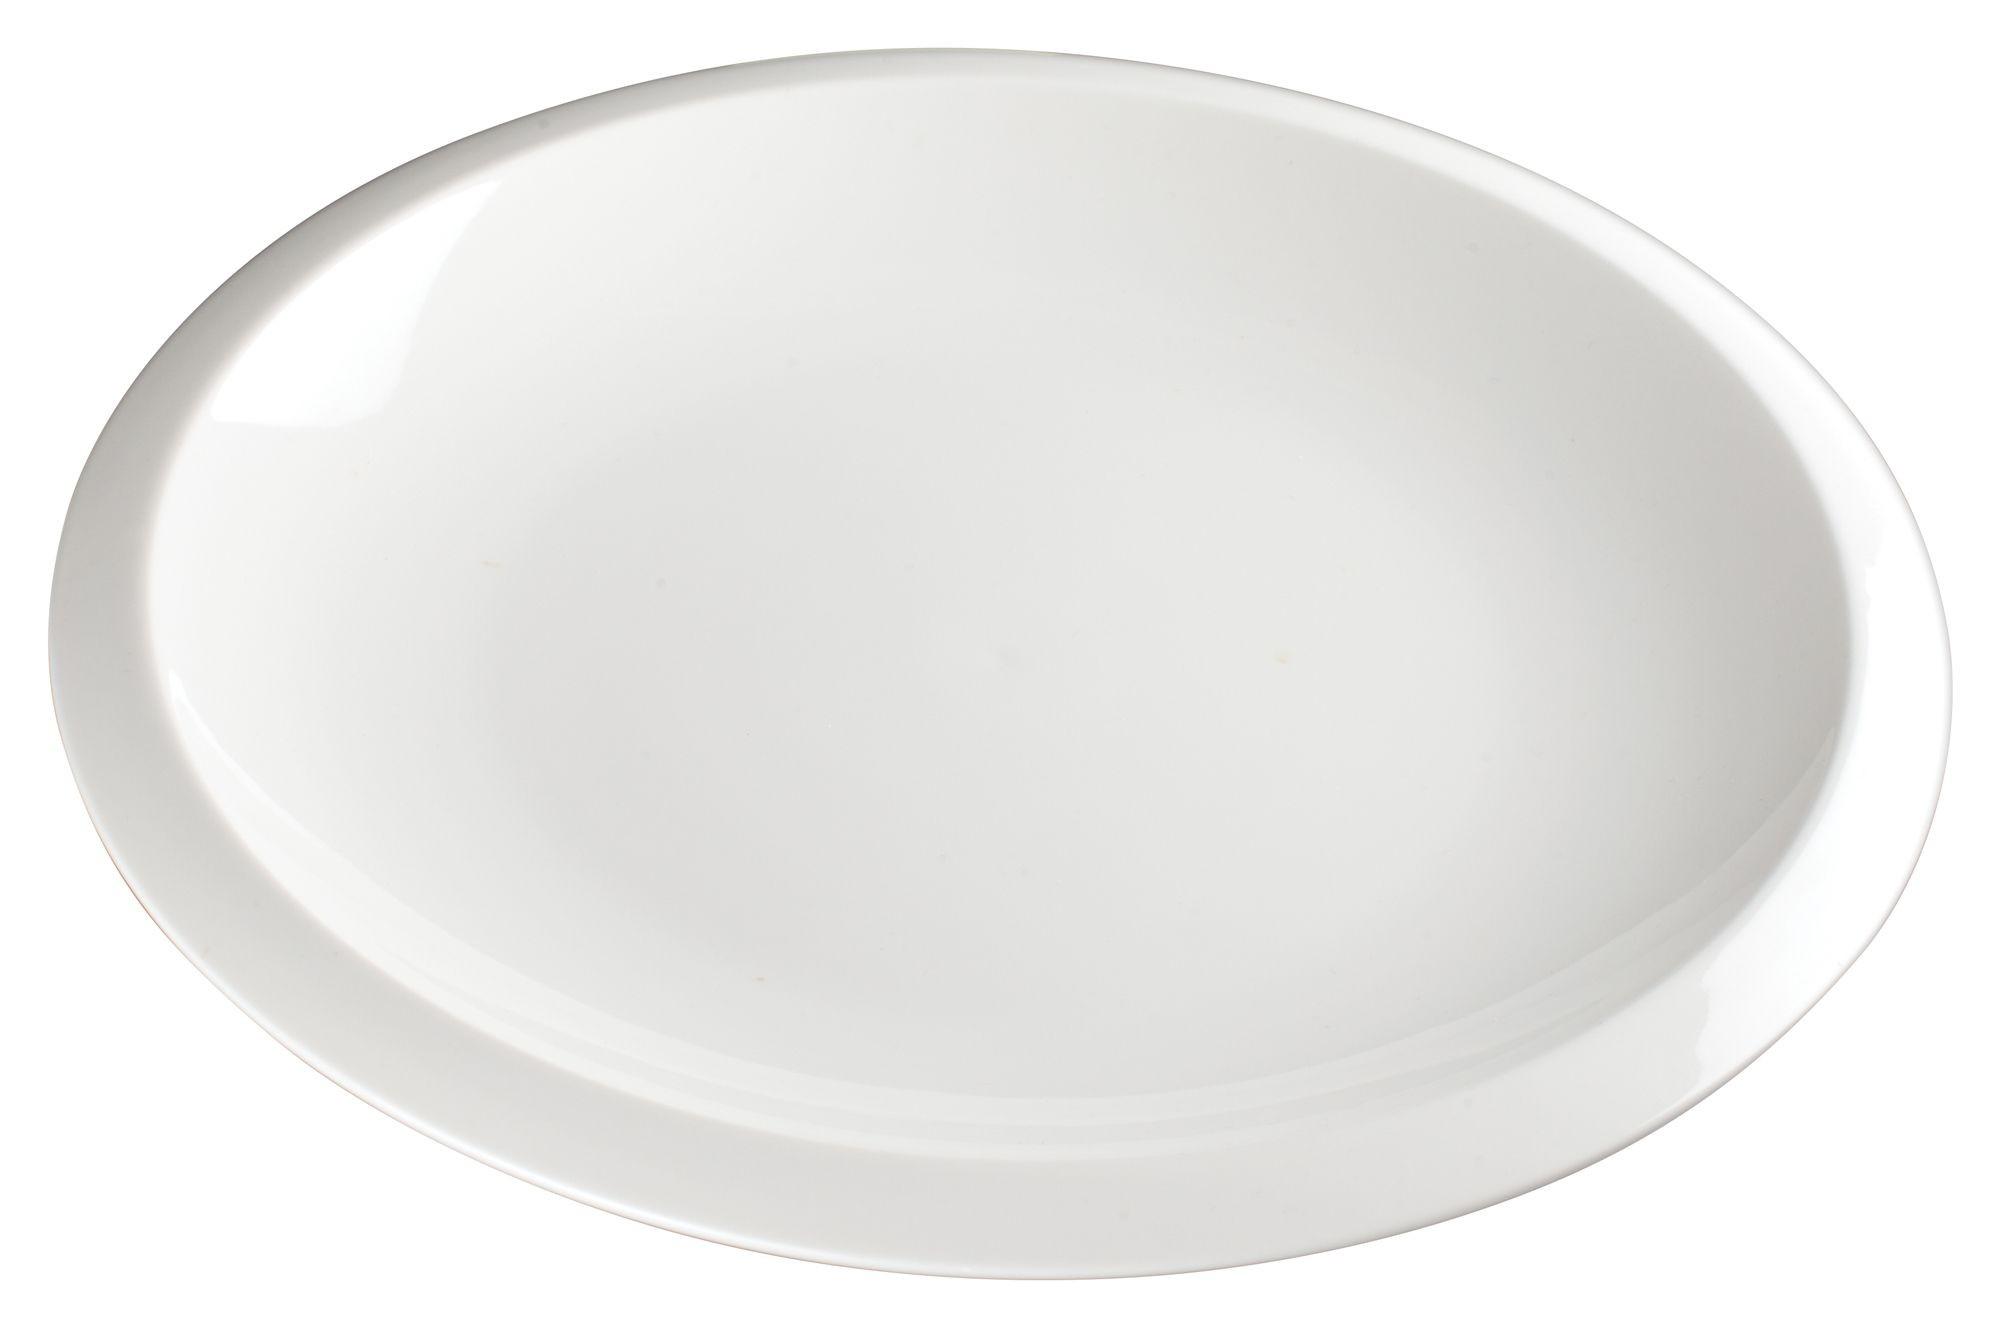 "Winco WDP006-203 Bergomi Creamy White Porcelain Round Platter 12-1/2"" Dia."